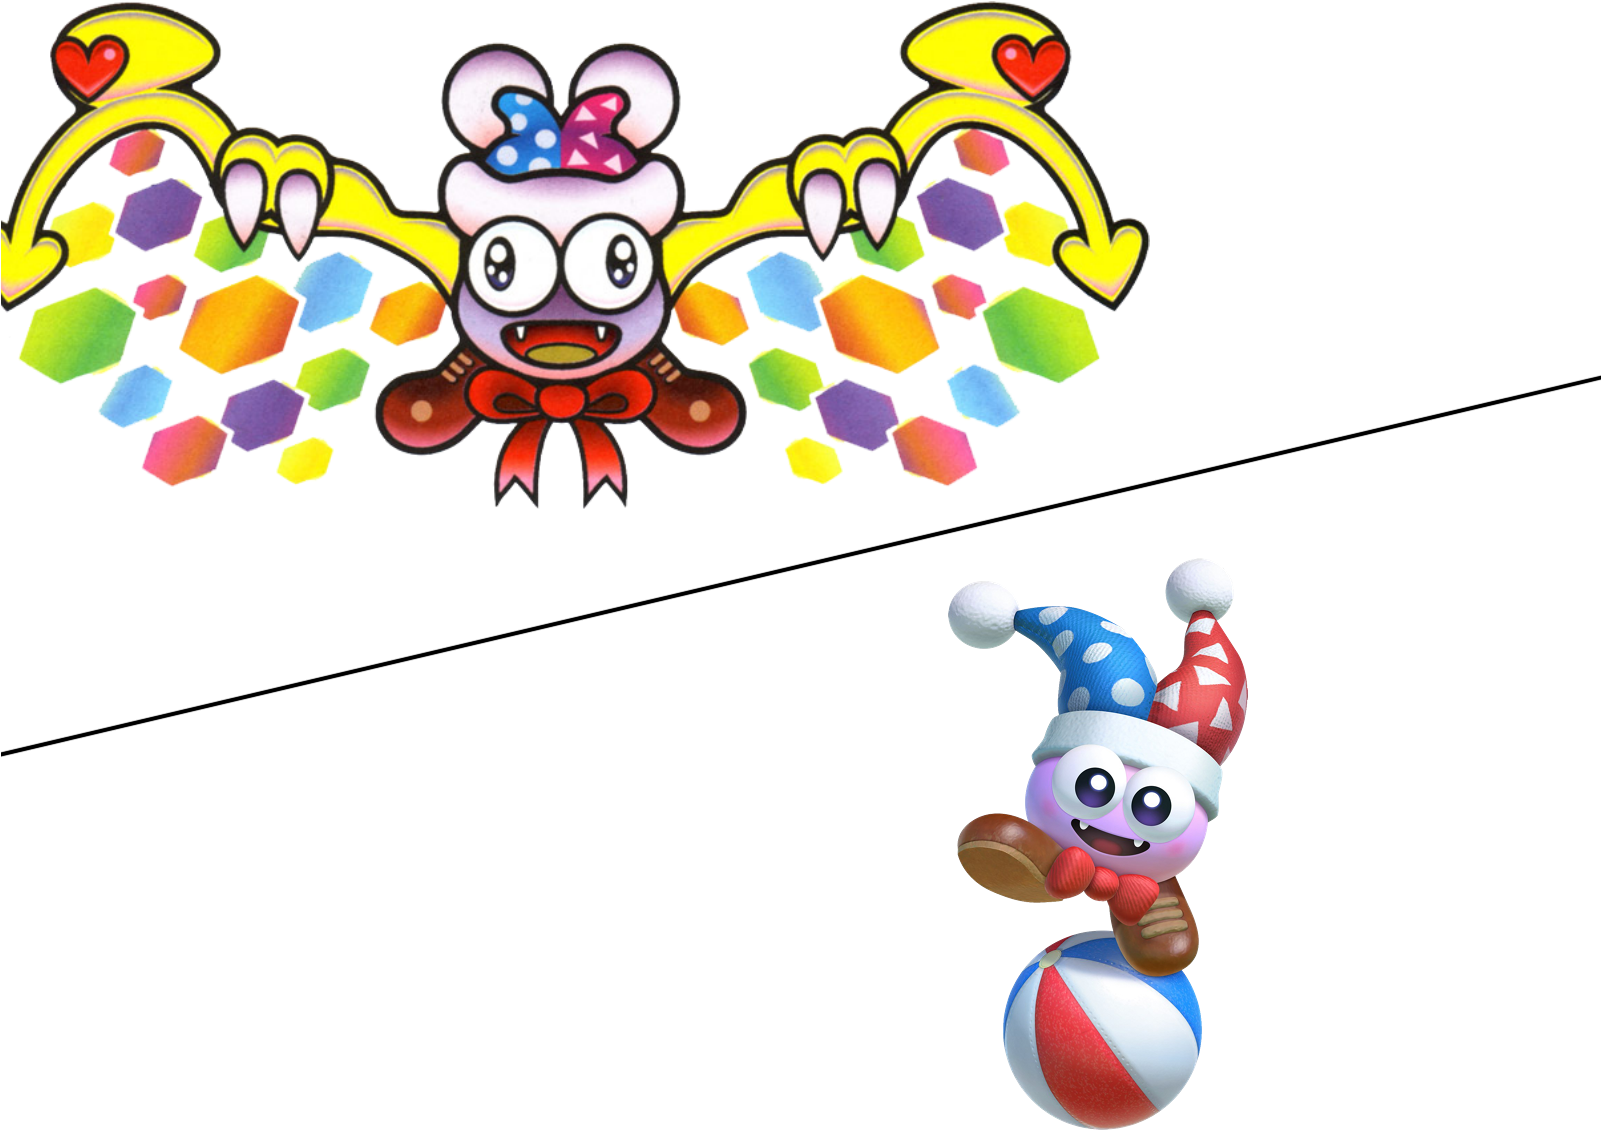 Kirby Shirt Roblox Download Hd Marxes Shirt Roblox Marx Kirby Transparent Png Image Nicepng Com